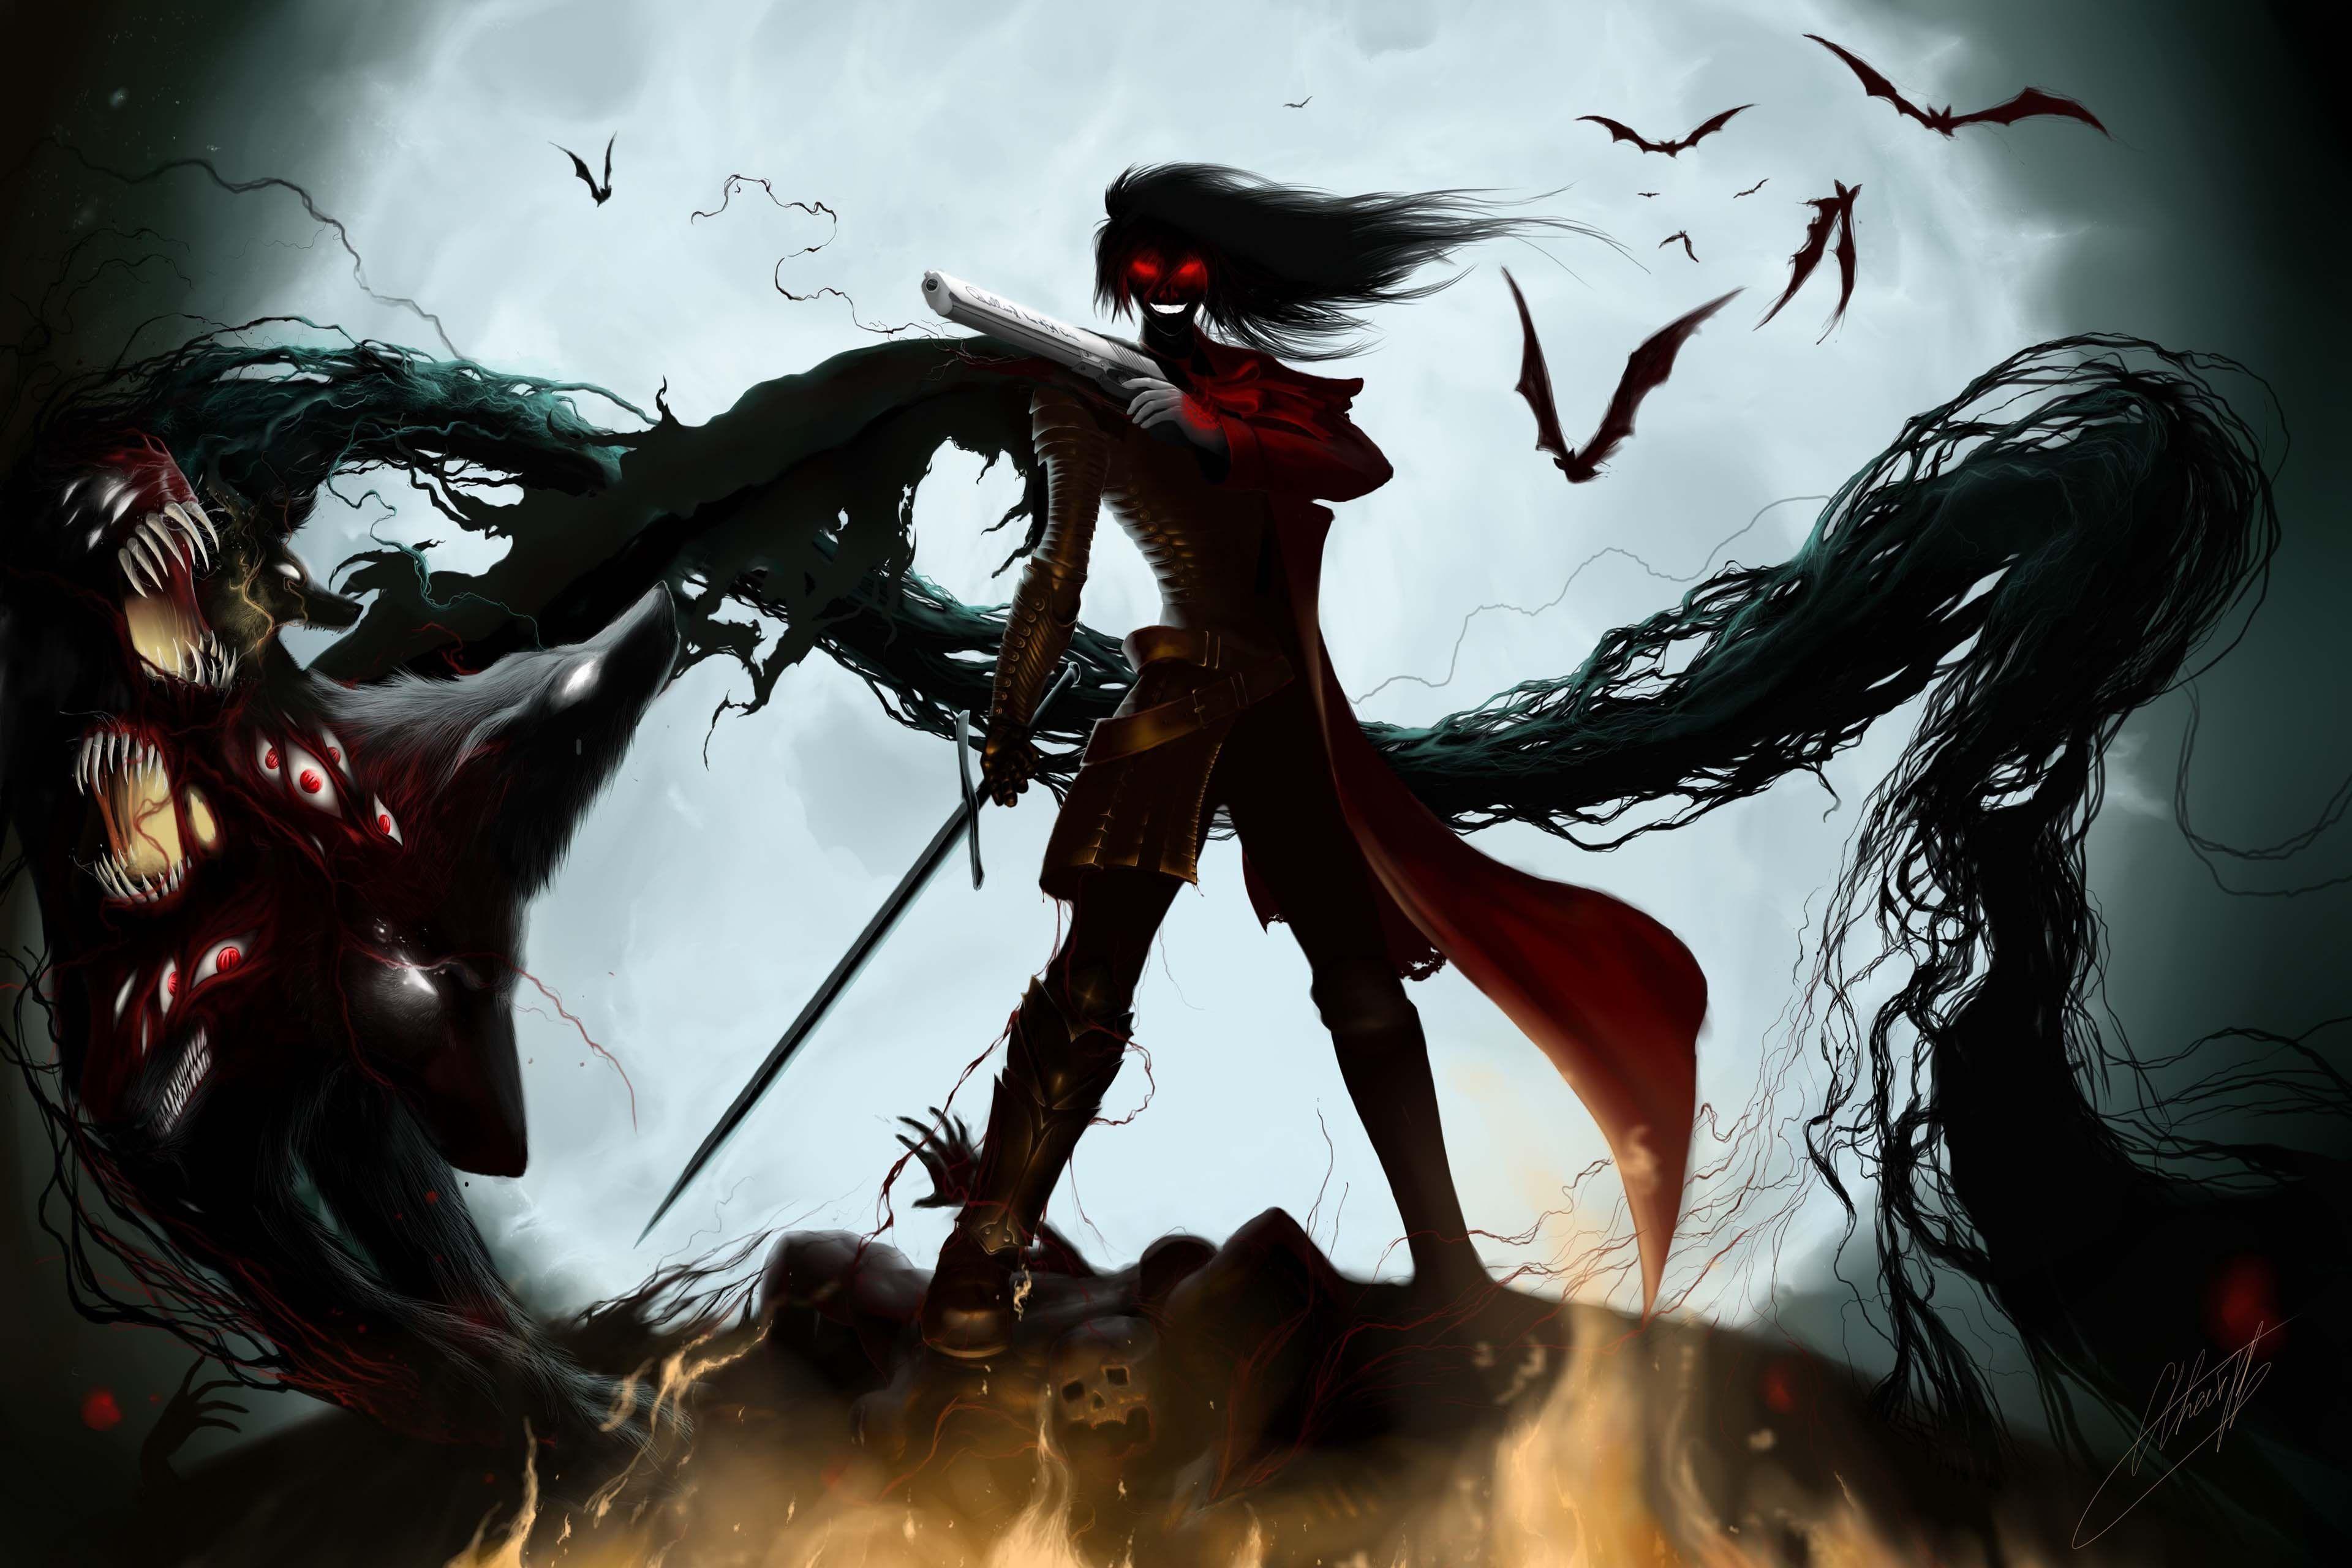 Alucard Hellsing alucard, Anime hd y Anime japones